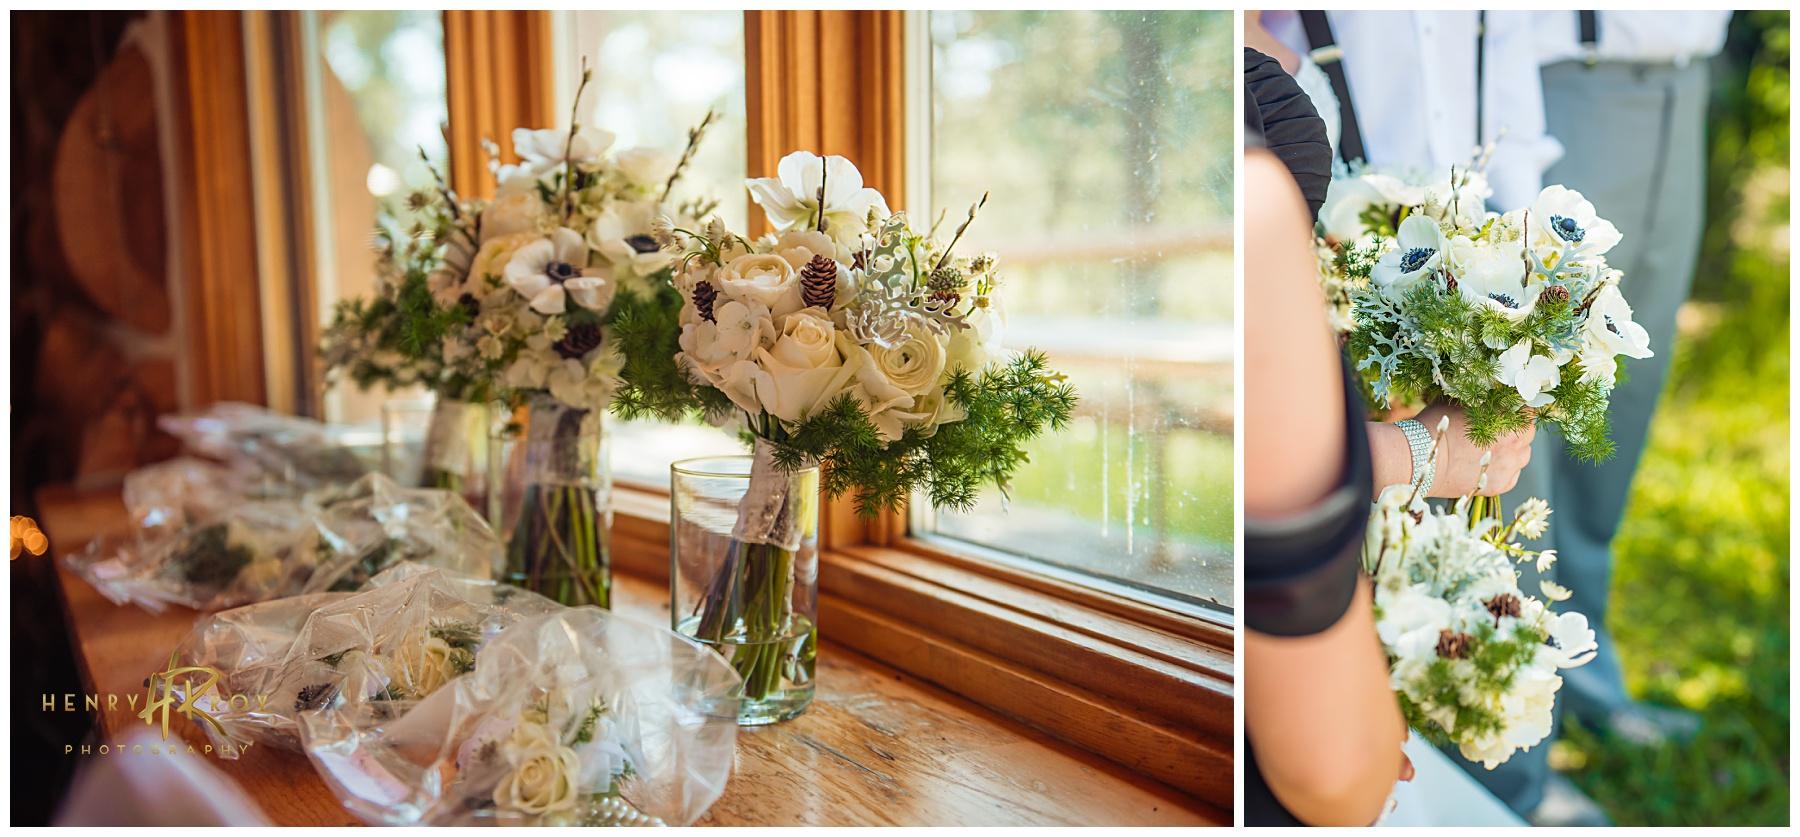 Wedding Photographer007.jpg